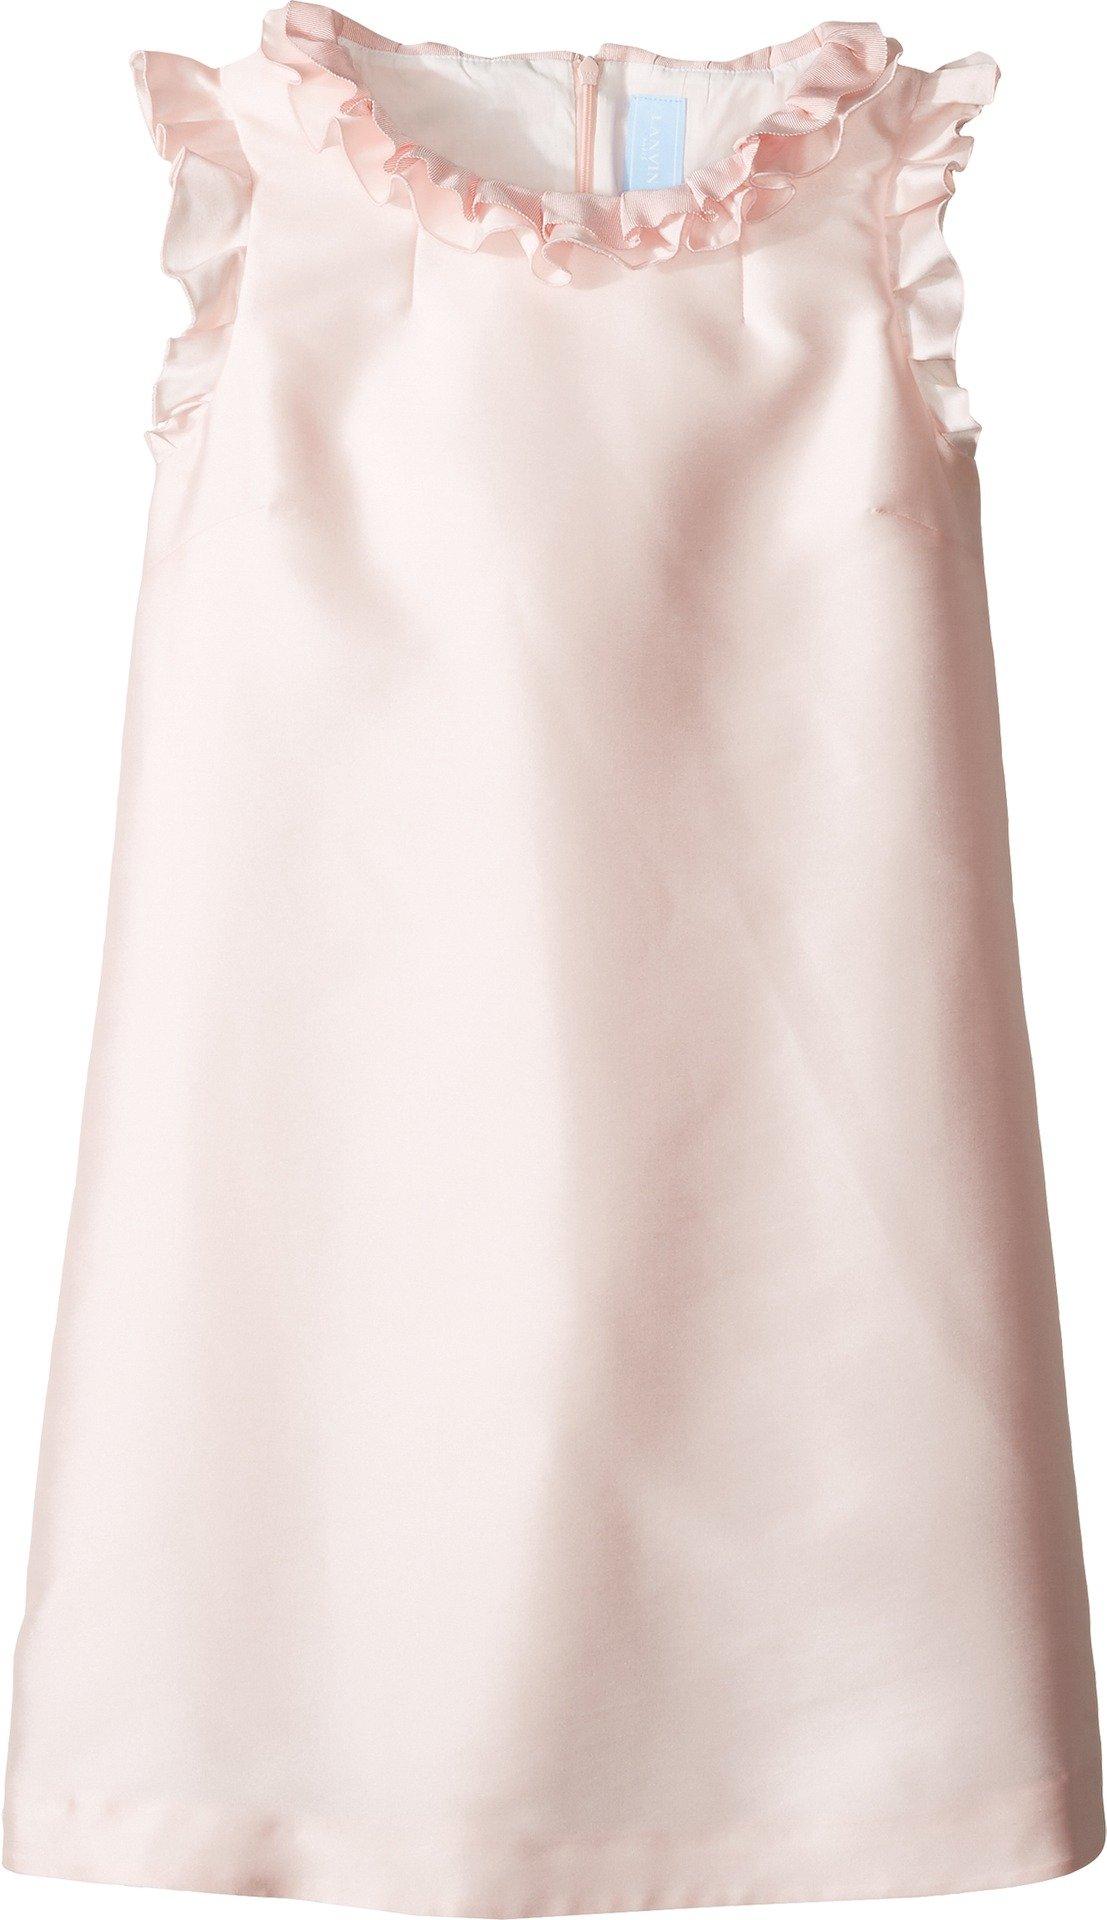 Lanvin Kids Girl's Dress w/Ruffle Collar & Sleeve Detail (Big Kids) Pink 14